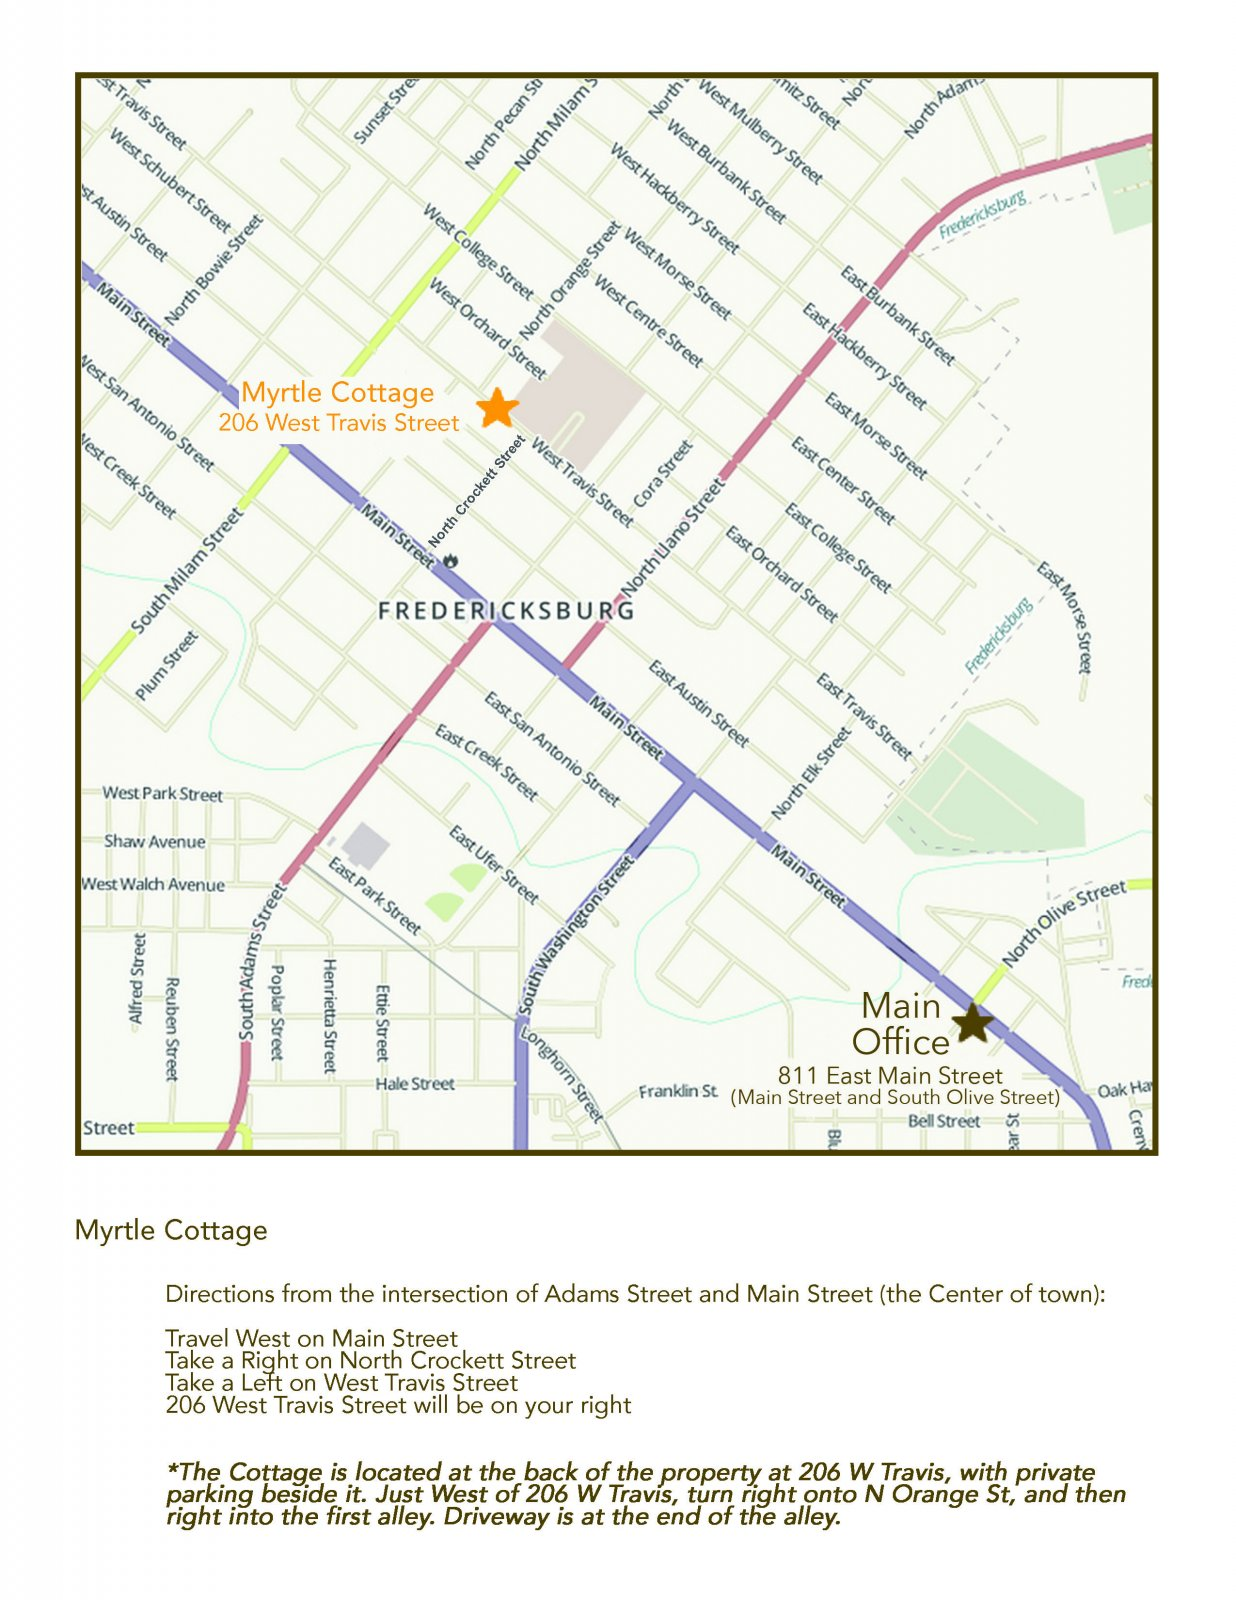 Myrtle Cottage Map | The Maplestone, Luxury Lodging of Fredericksburg, Texas